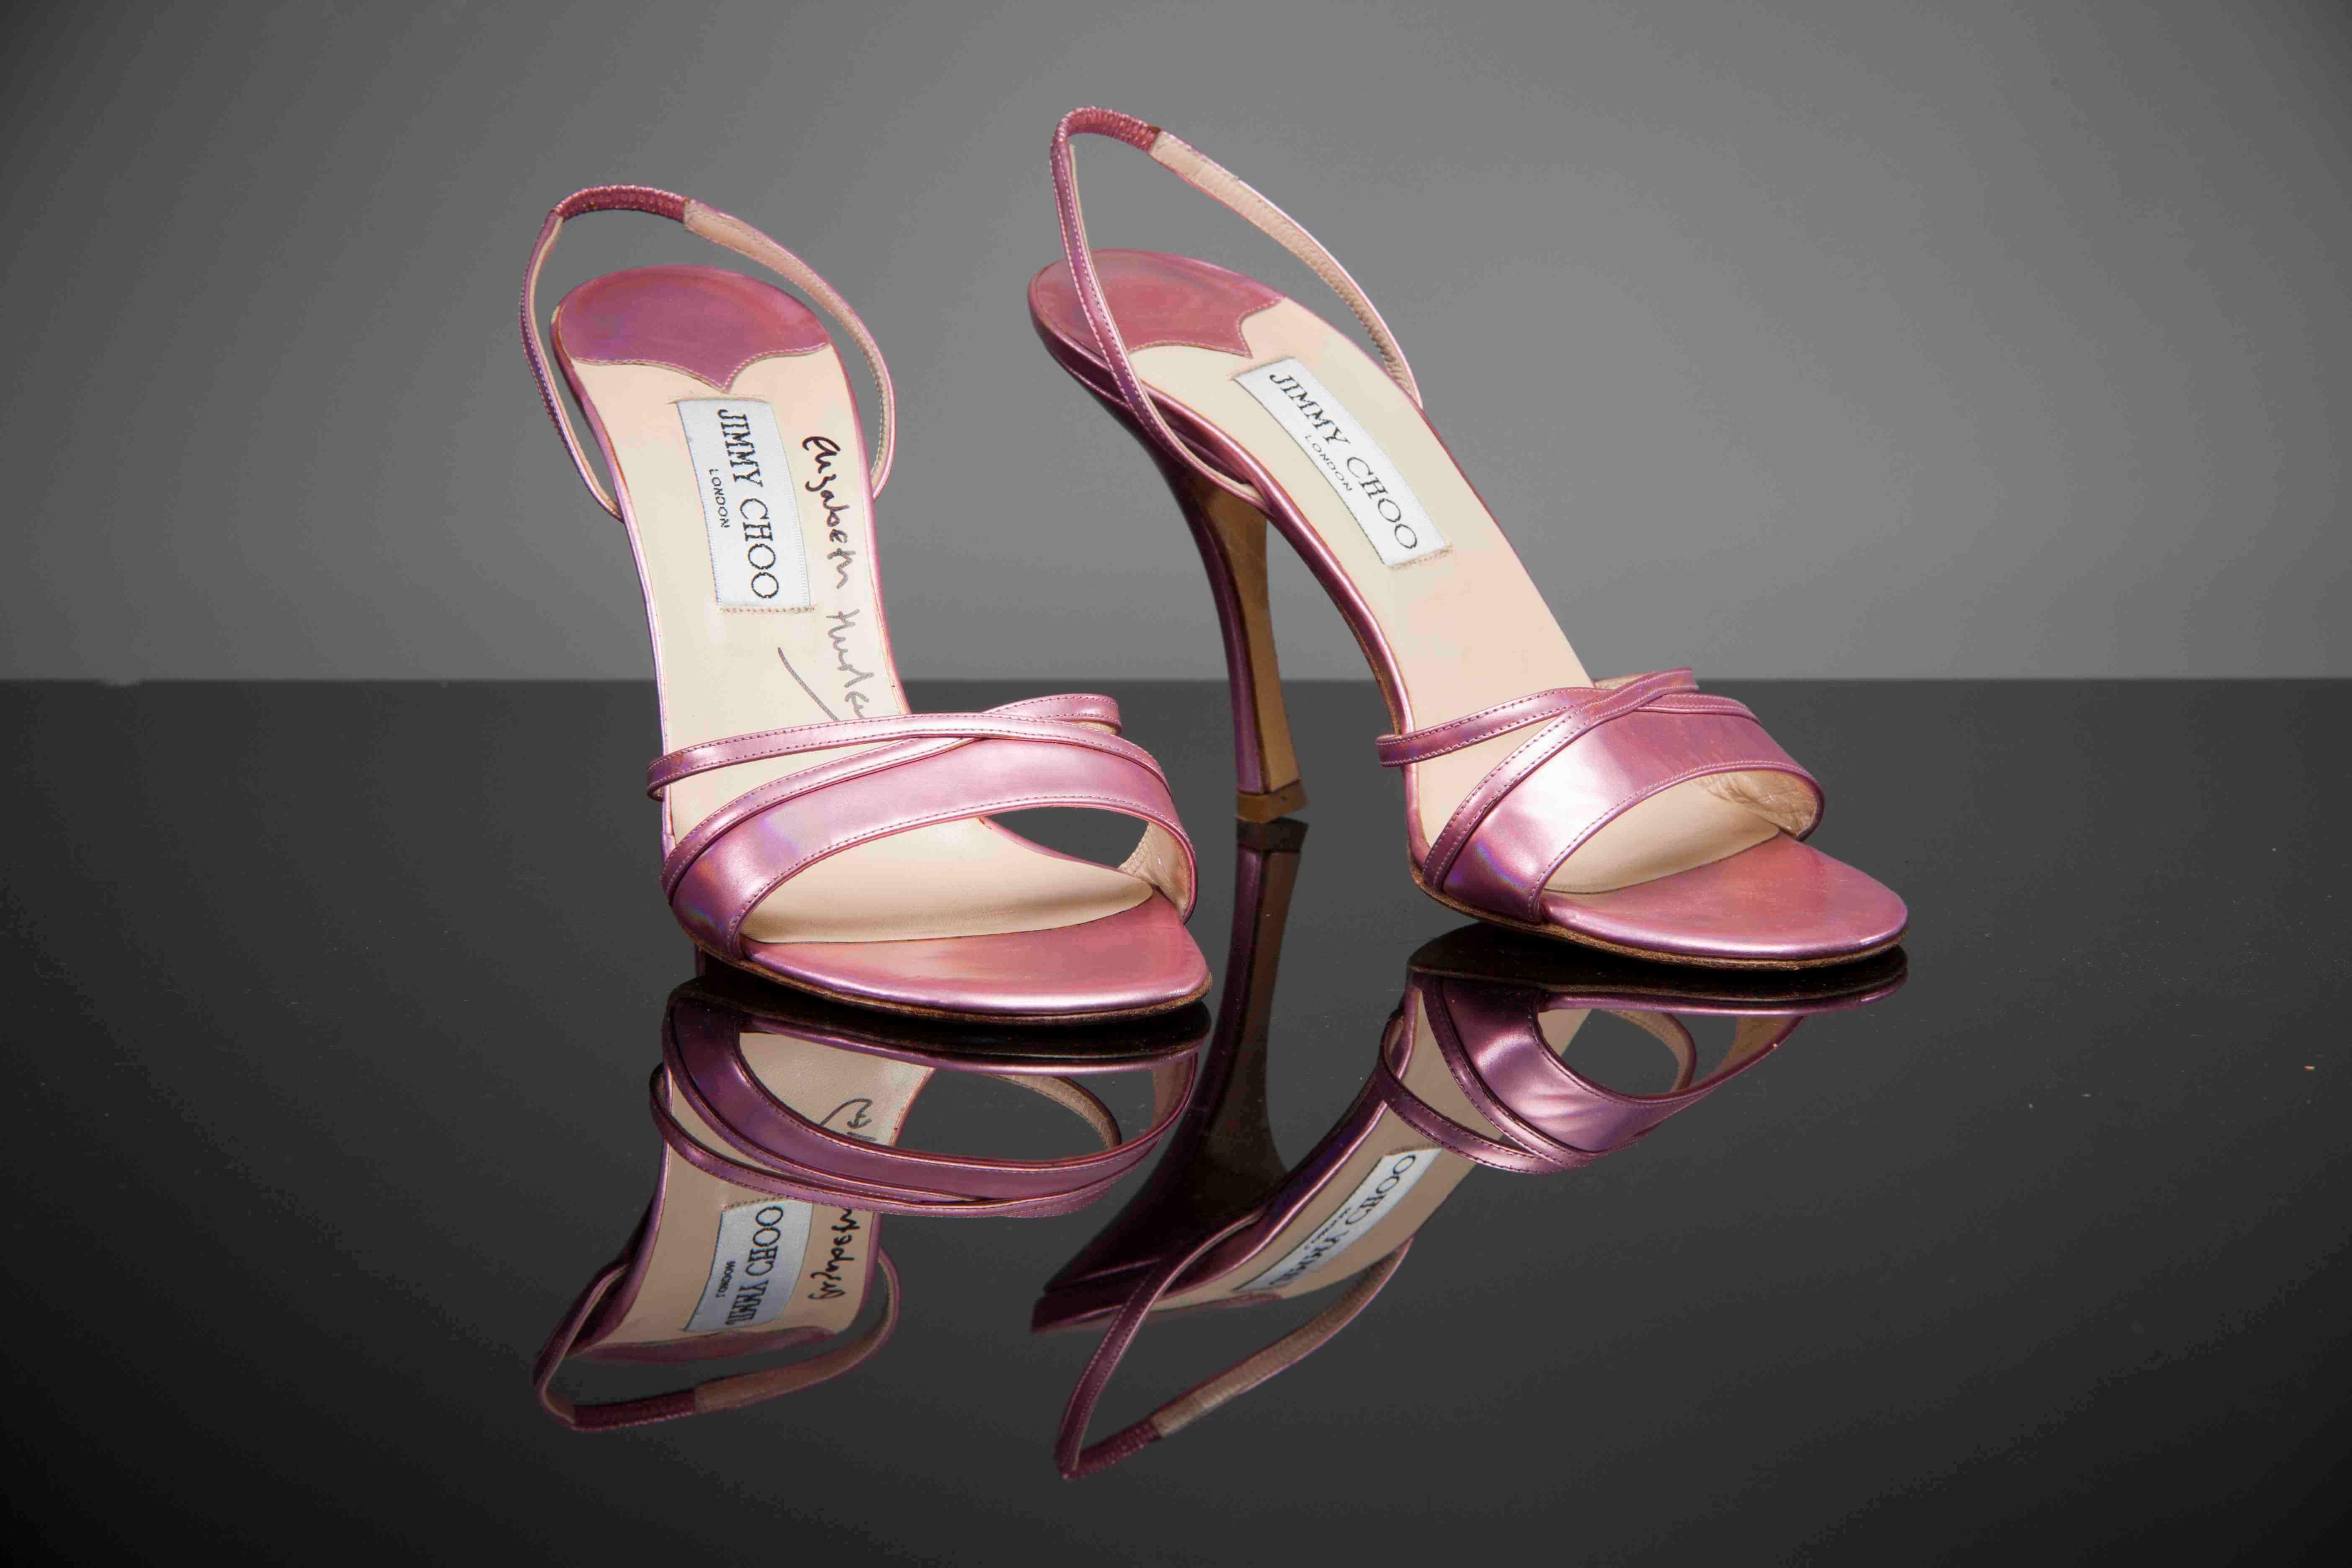 Elizabeth Hurley's size 6 shoes